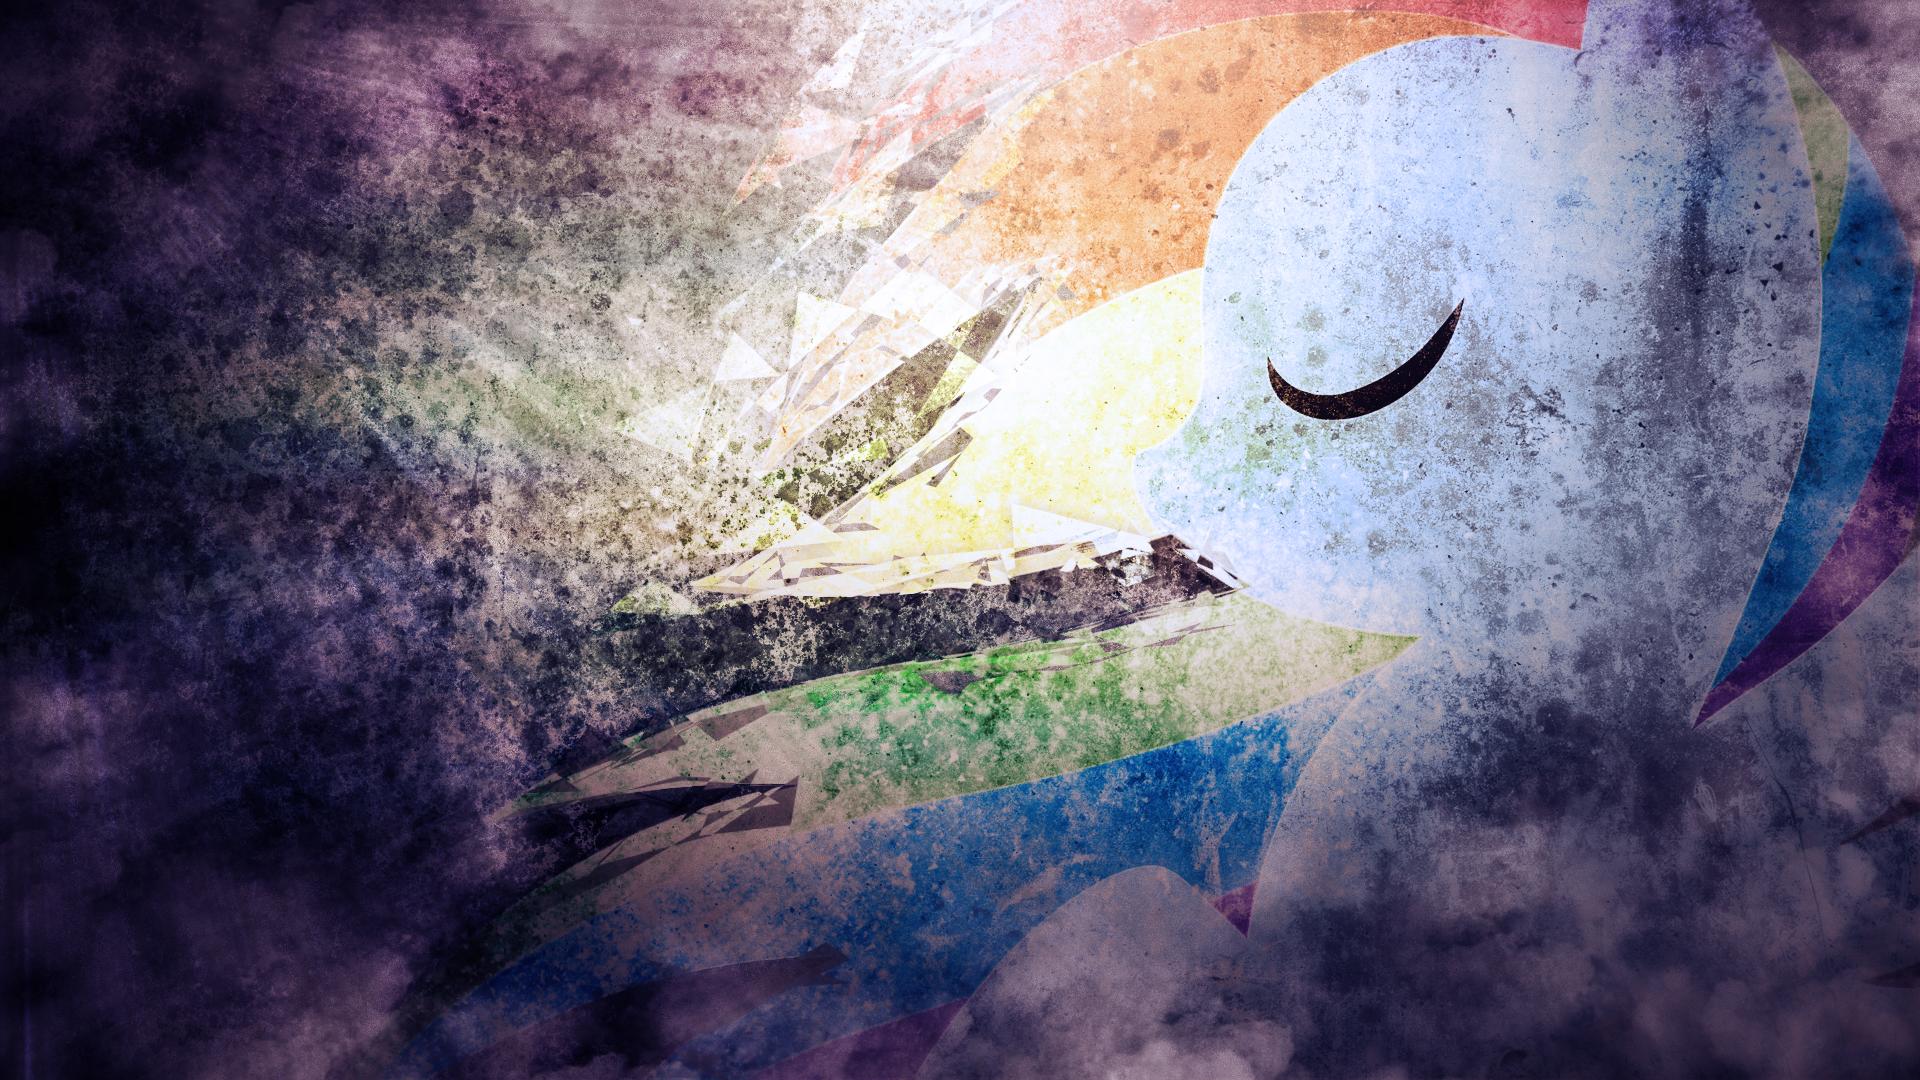 Rainbow Dash - MegaSweet (20% Cooler Edit) by MegaSweet and SandwichDelta